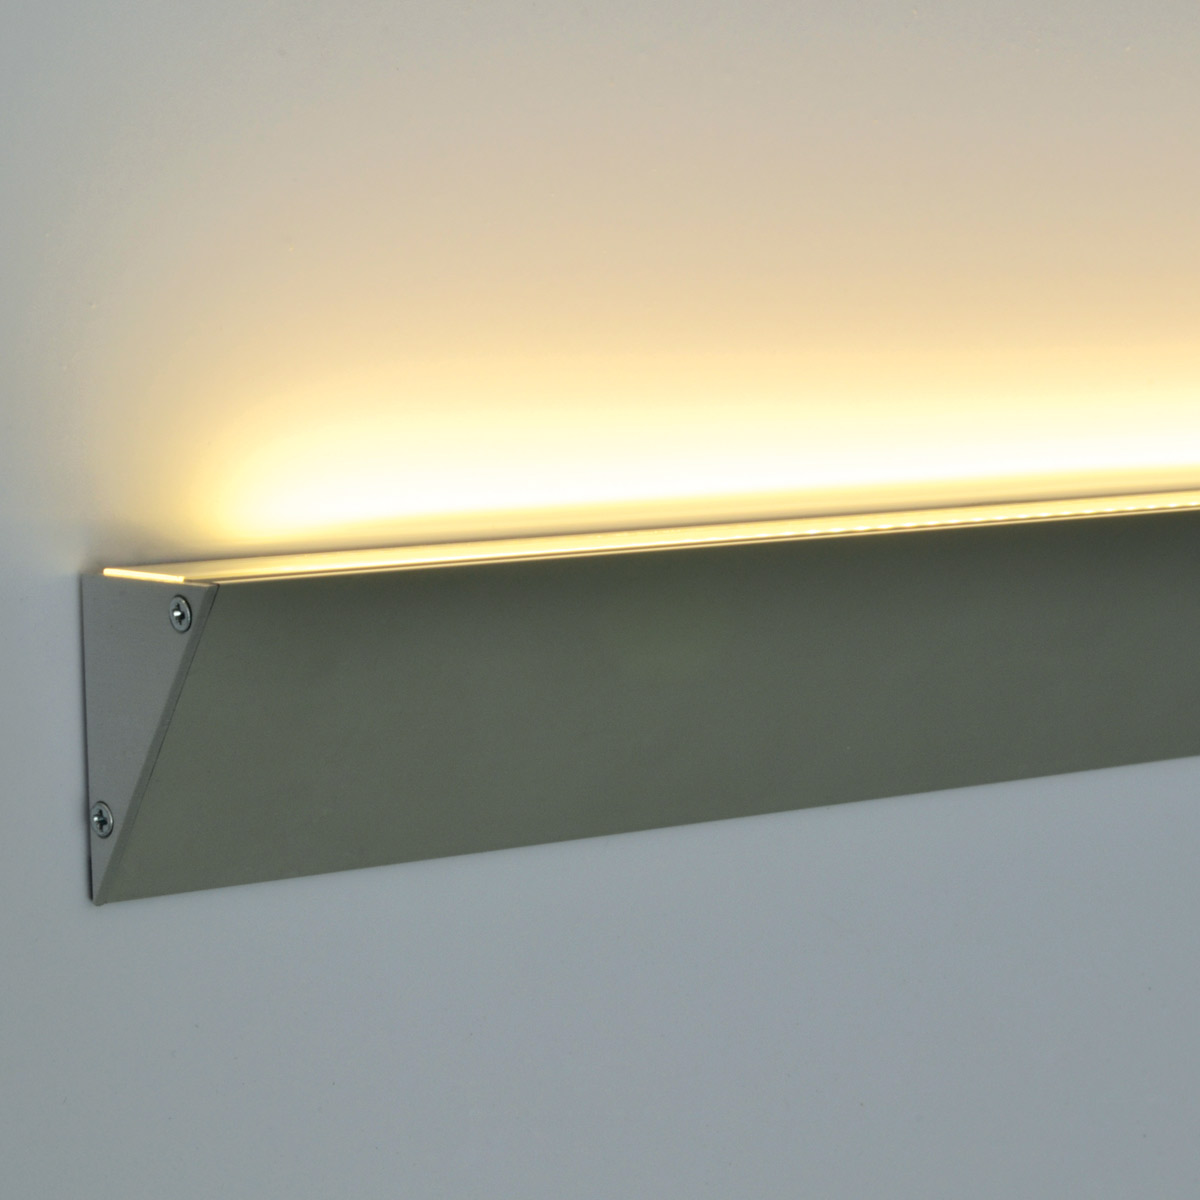 Profili per rivestimenti Lampada LEM 37 A11 Profilitec